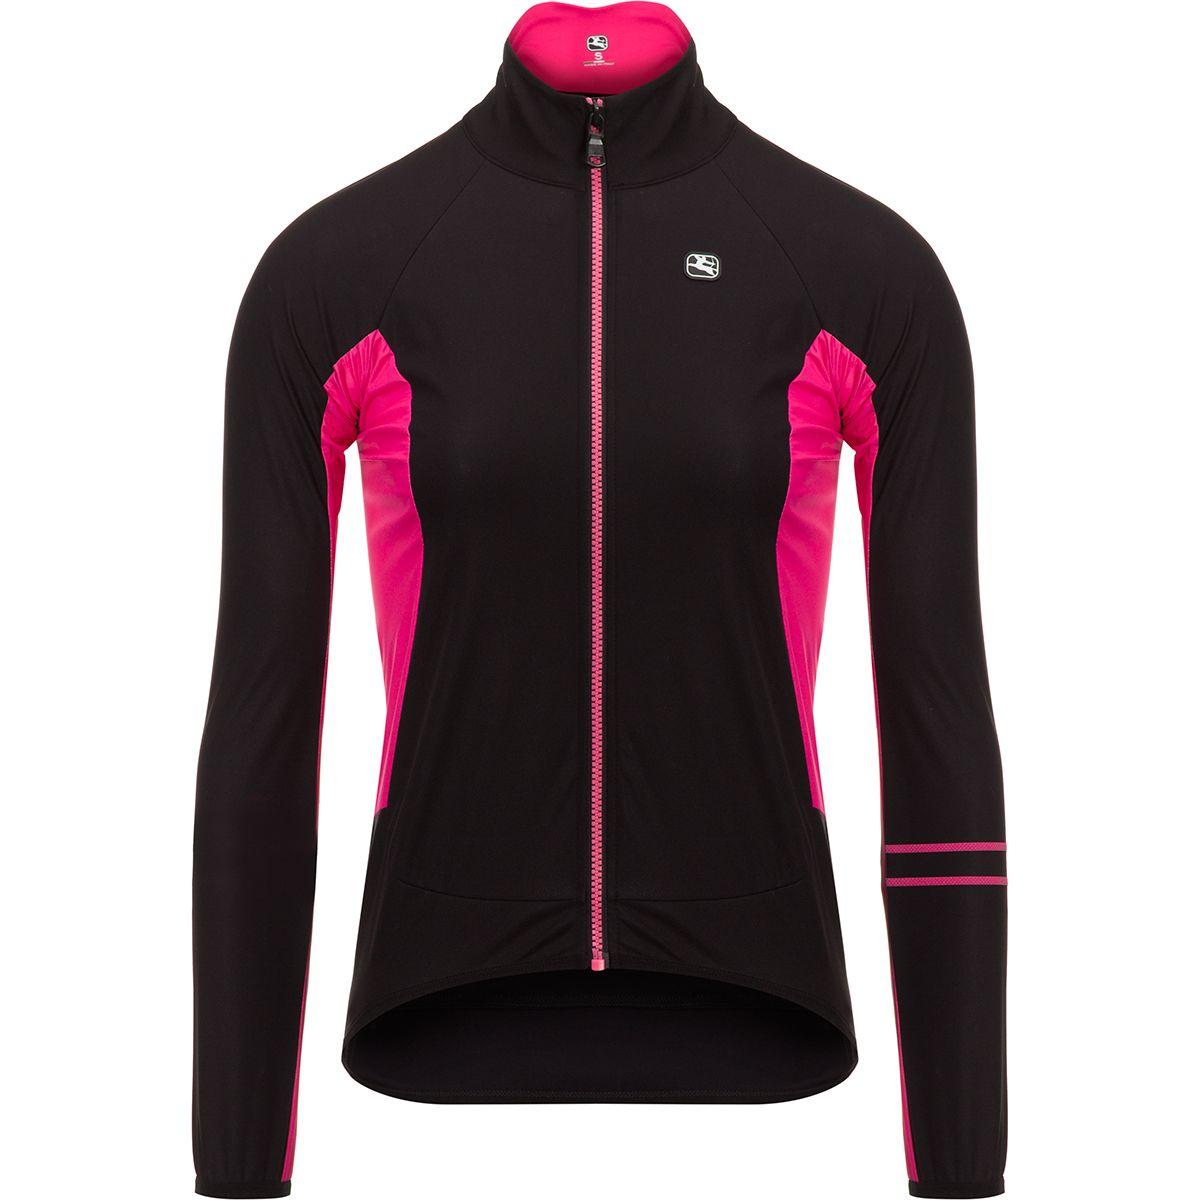 Giordana AV-100 Jacket - Women's